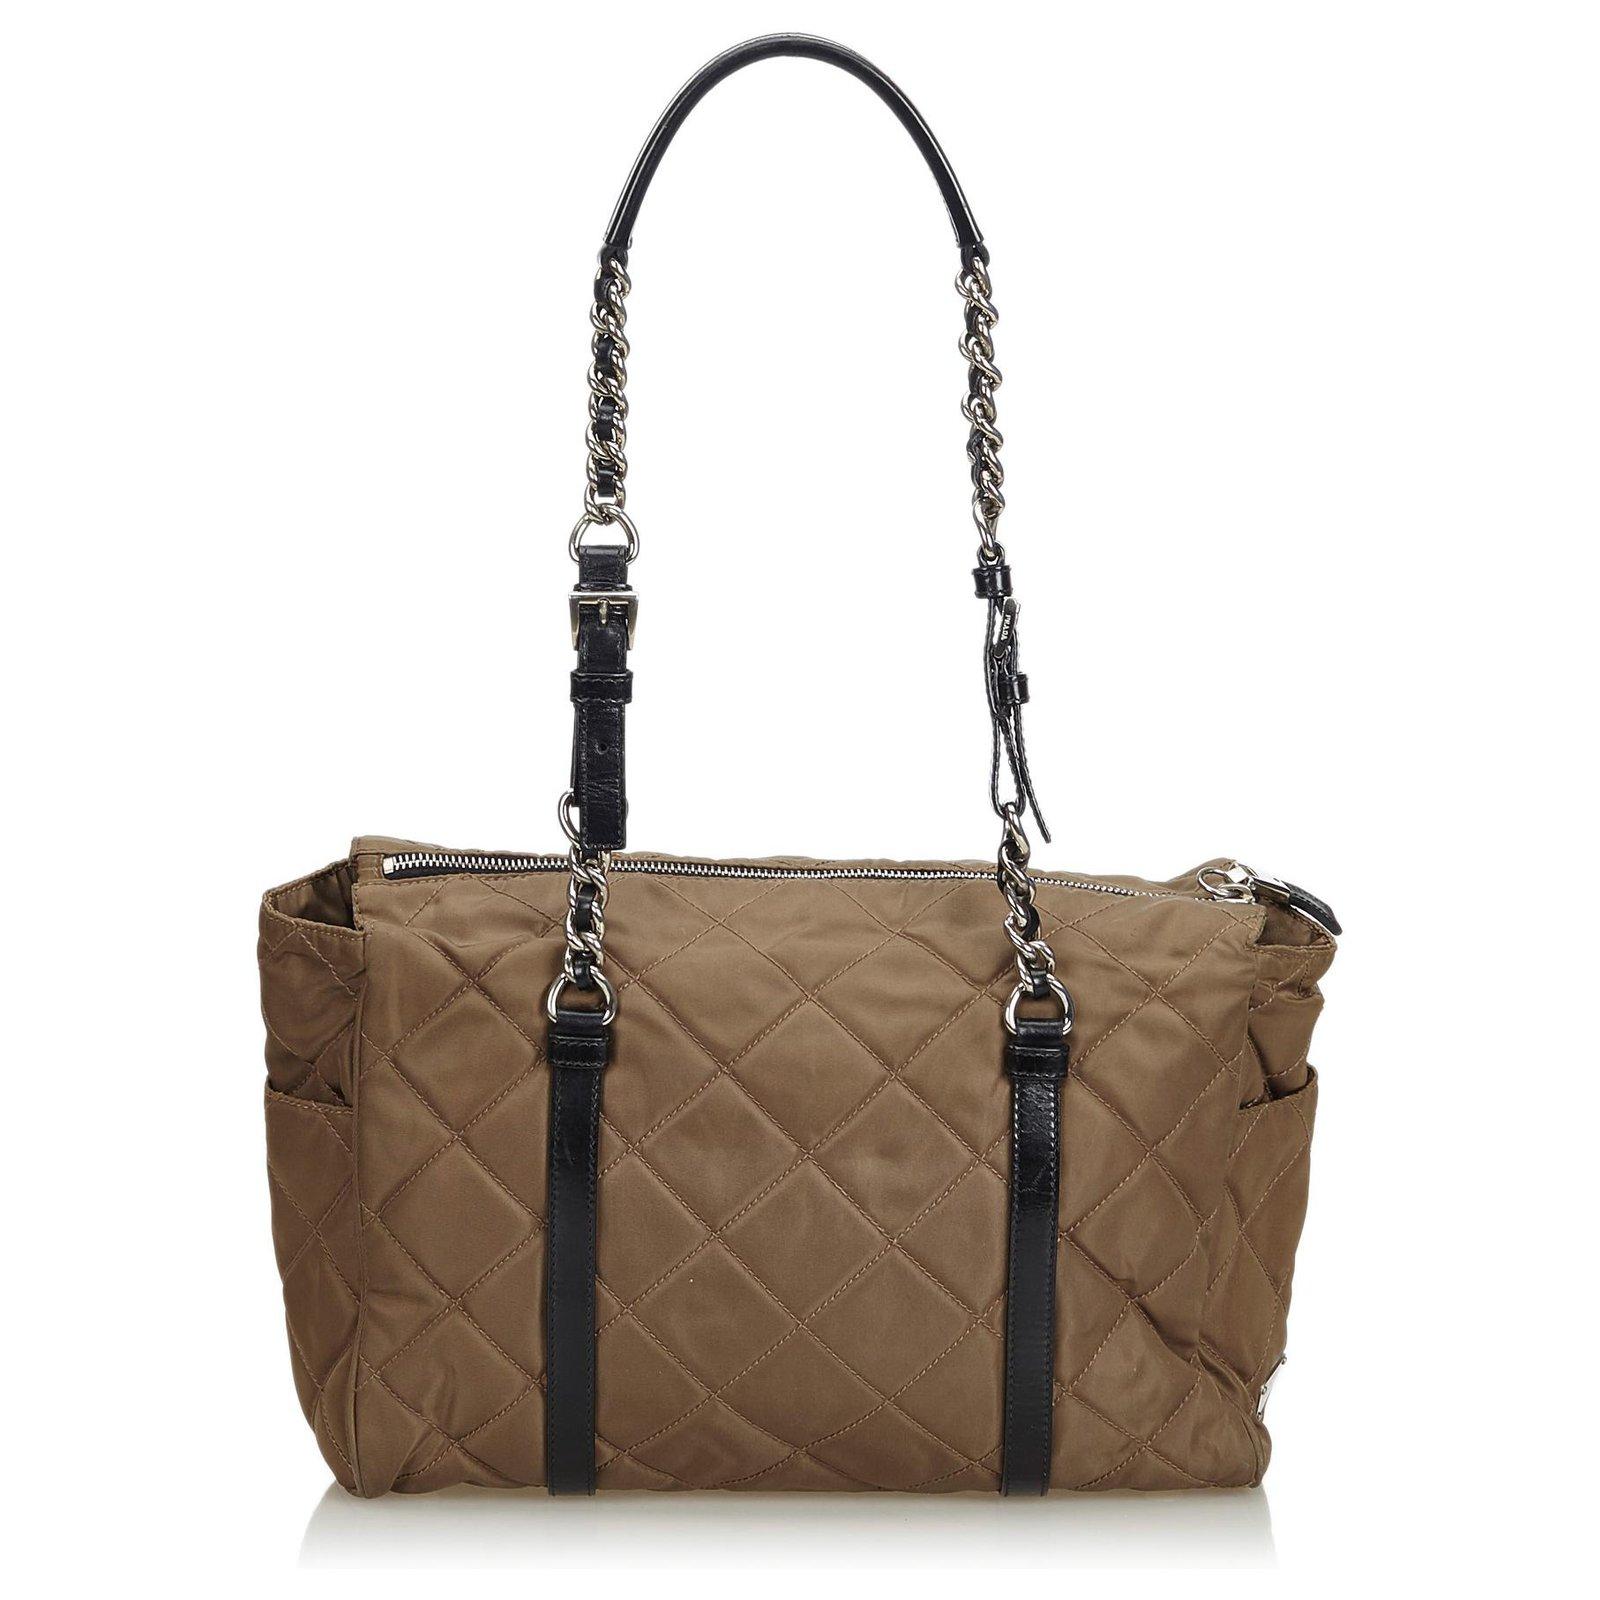 15717e7bc01c Prada Quilted Tessuto Nylon Chain Shoulder Bag Handbags Leather ...